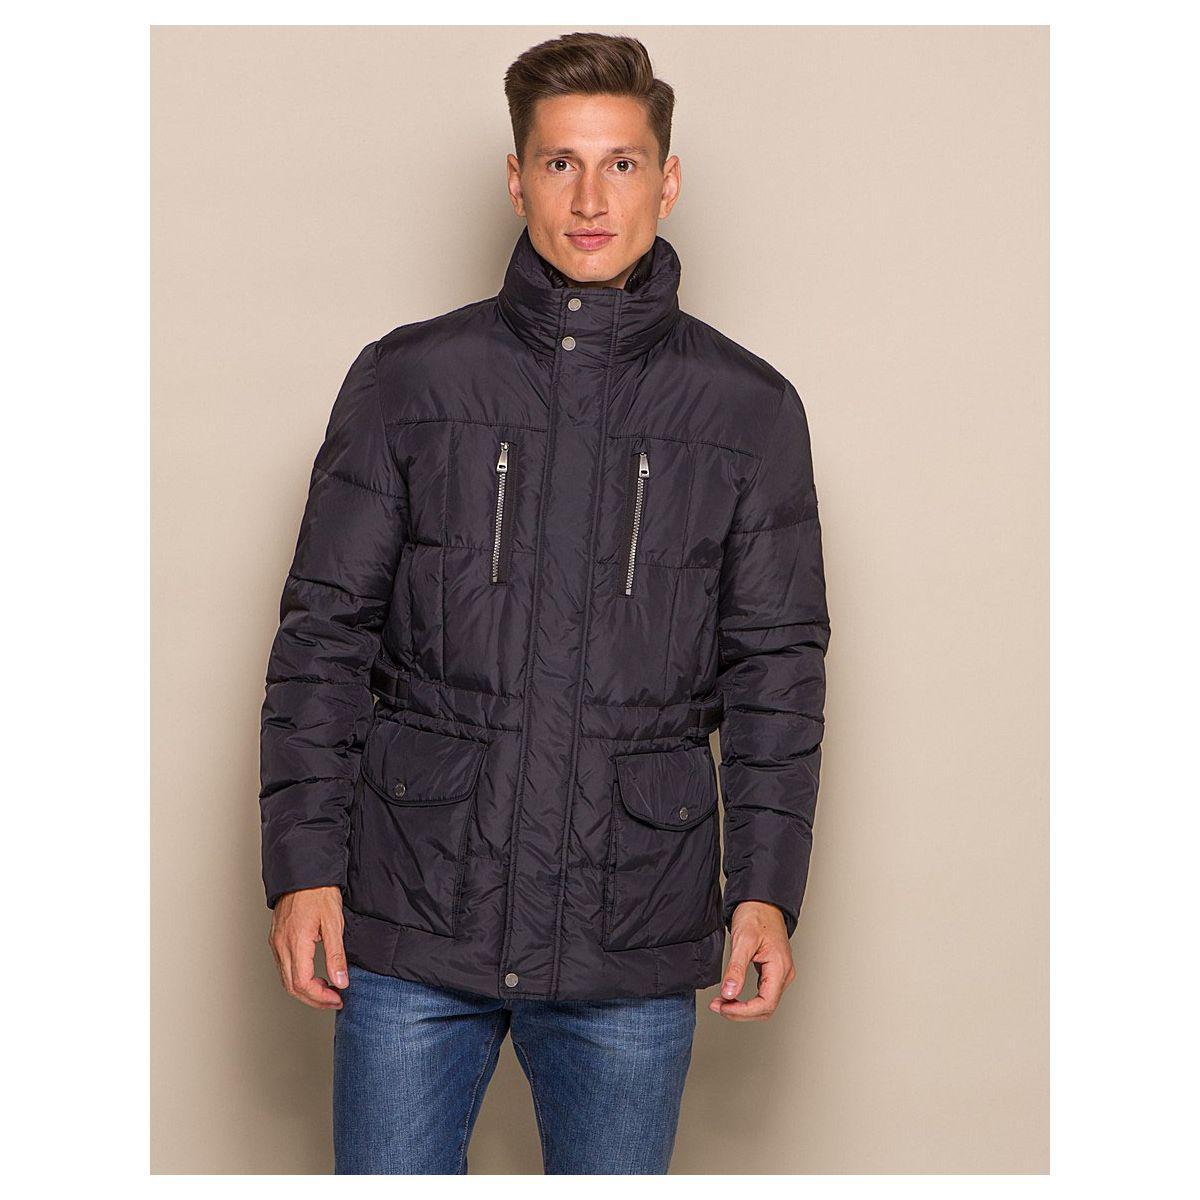 Демисезонная мужская куртка Geox M4428A BLACK